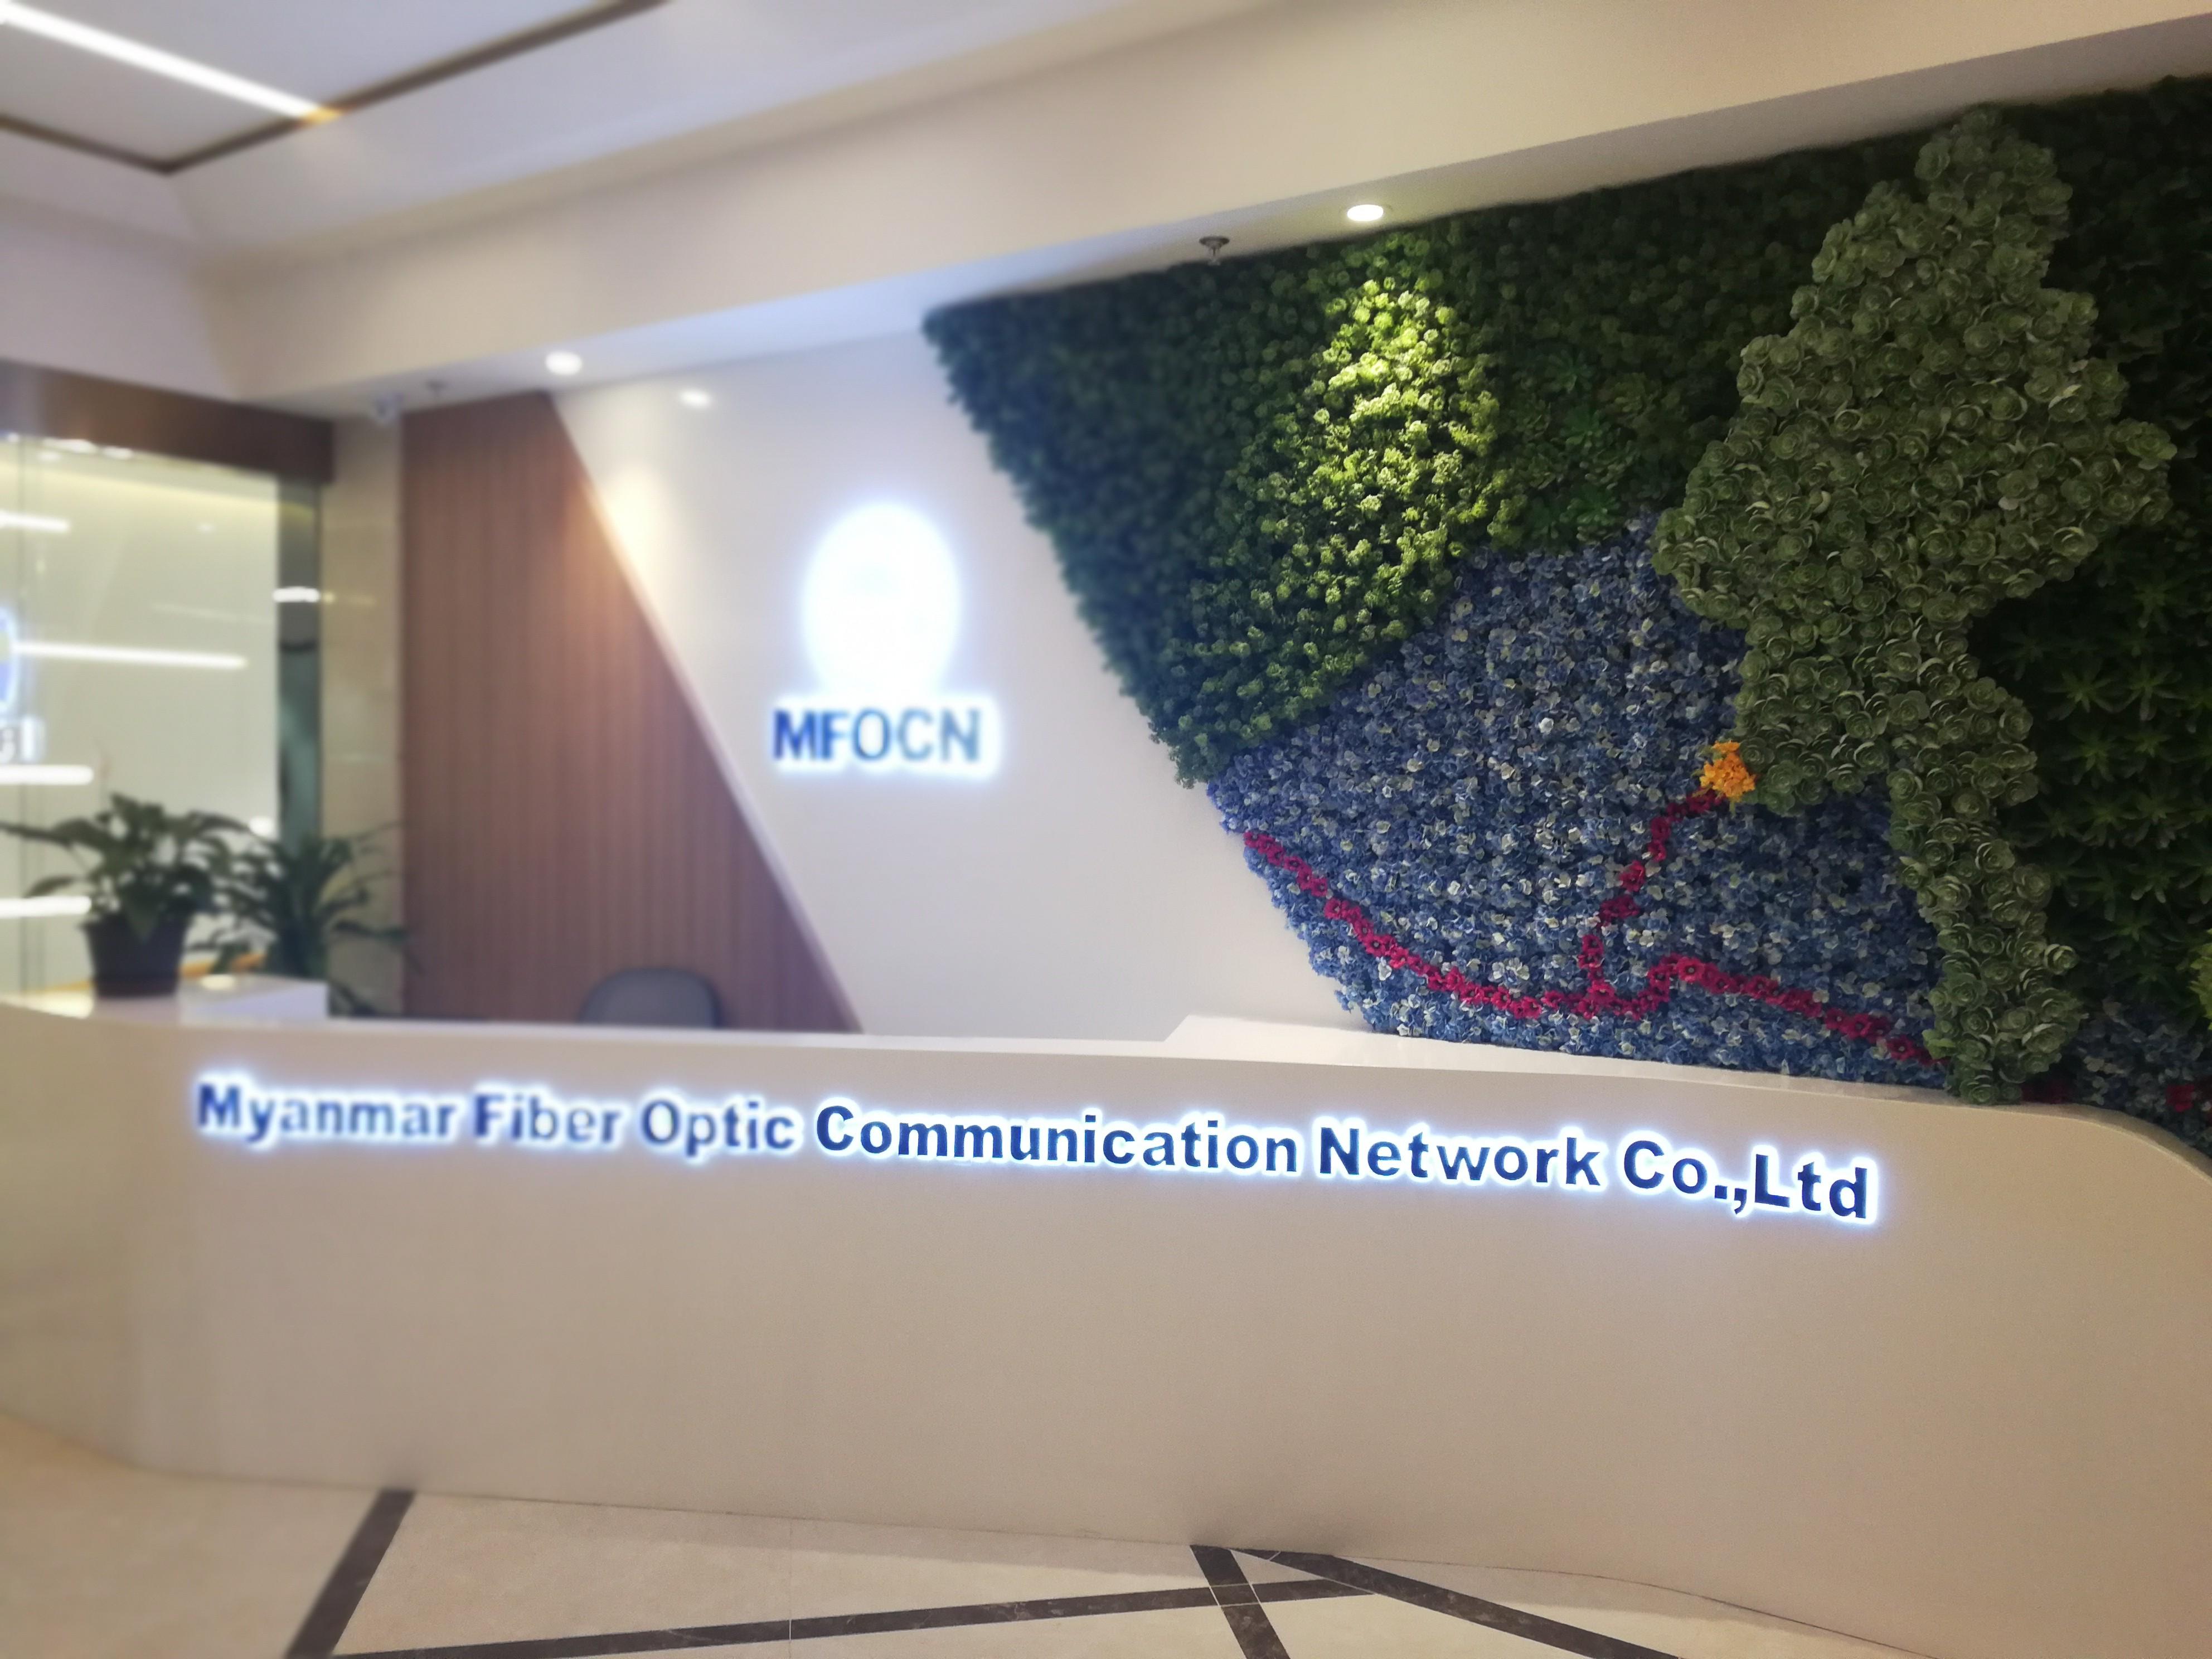 Myanmar Fiber Optic Communication Network Co ,Ltd | LinkedIn